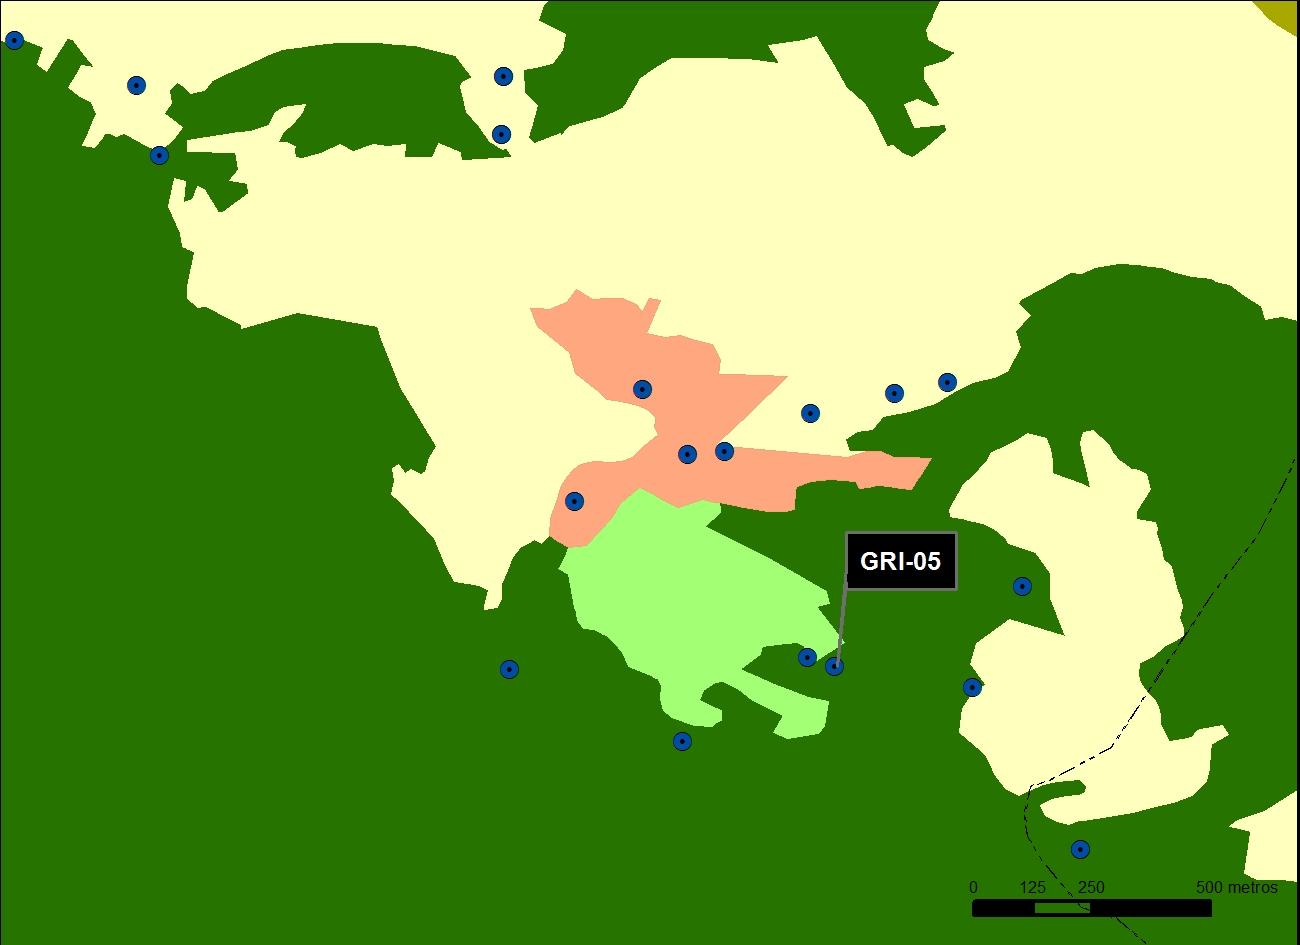 GRI_05_M.V.LOZANO_COLMENA MALENA_MAP.VEG